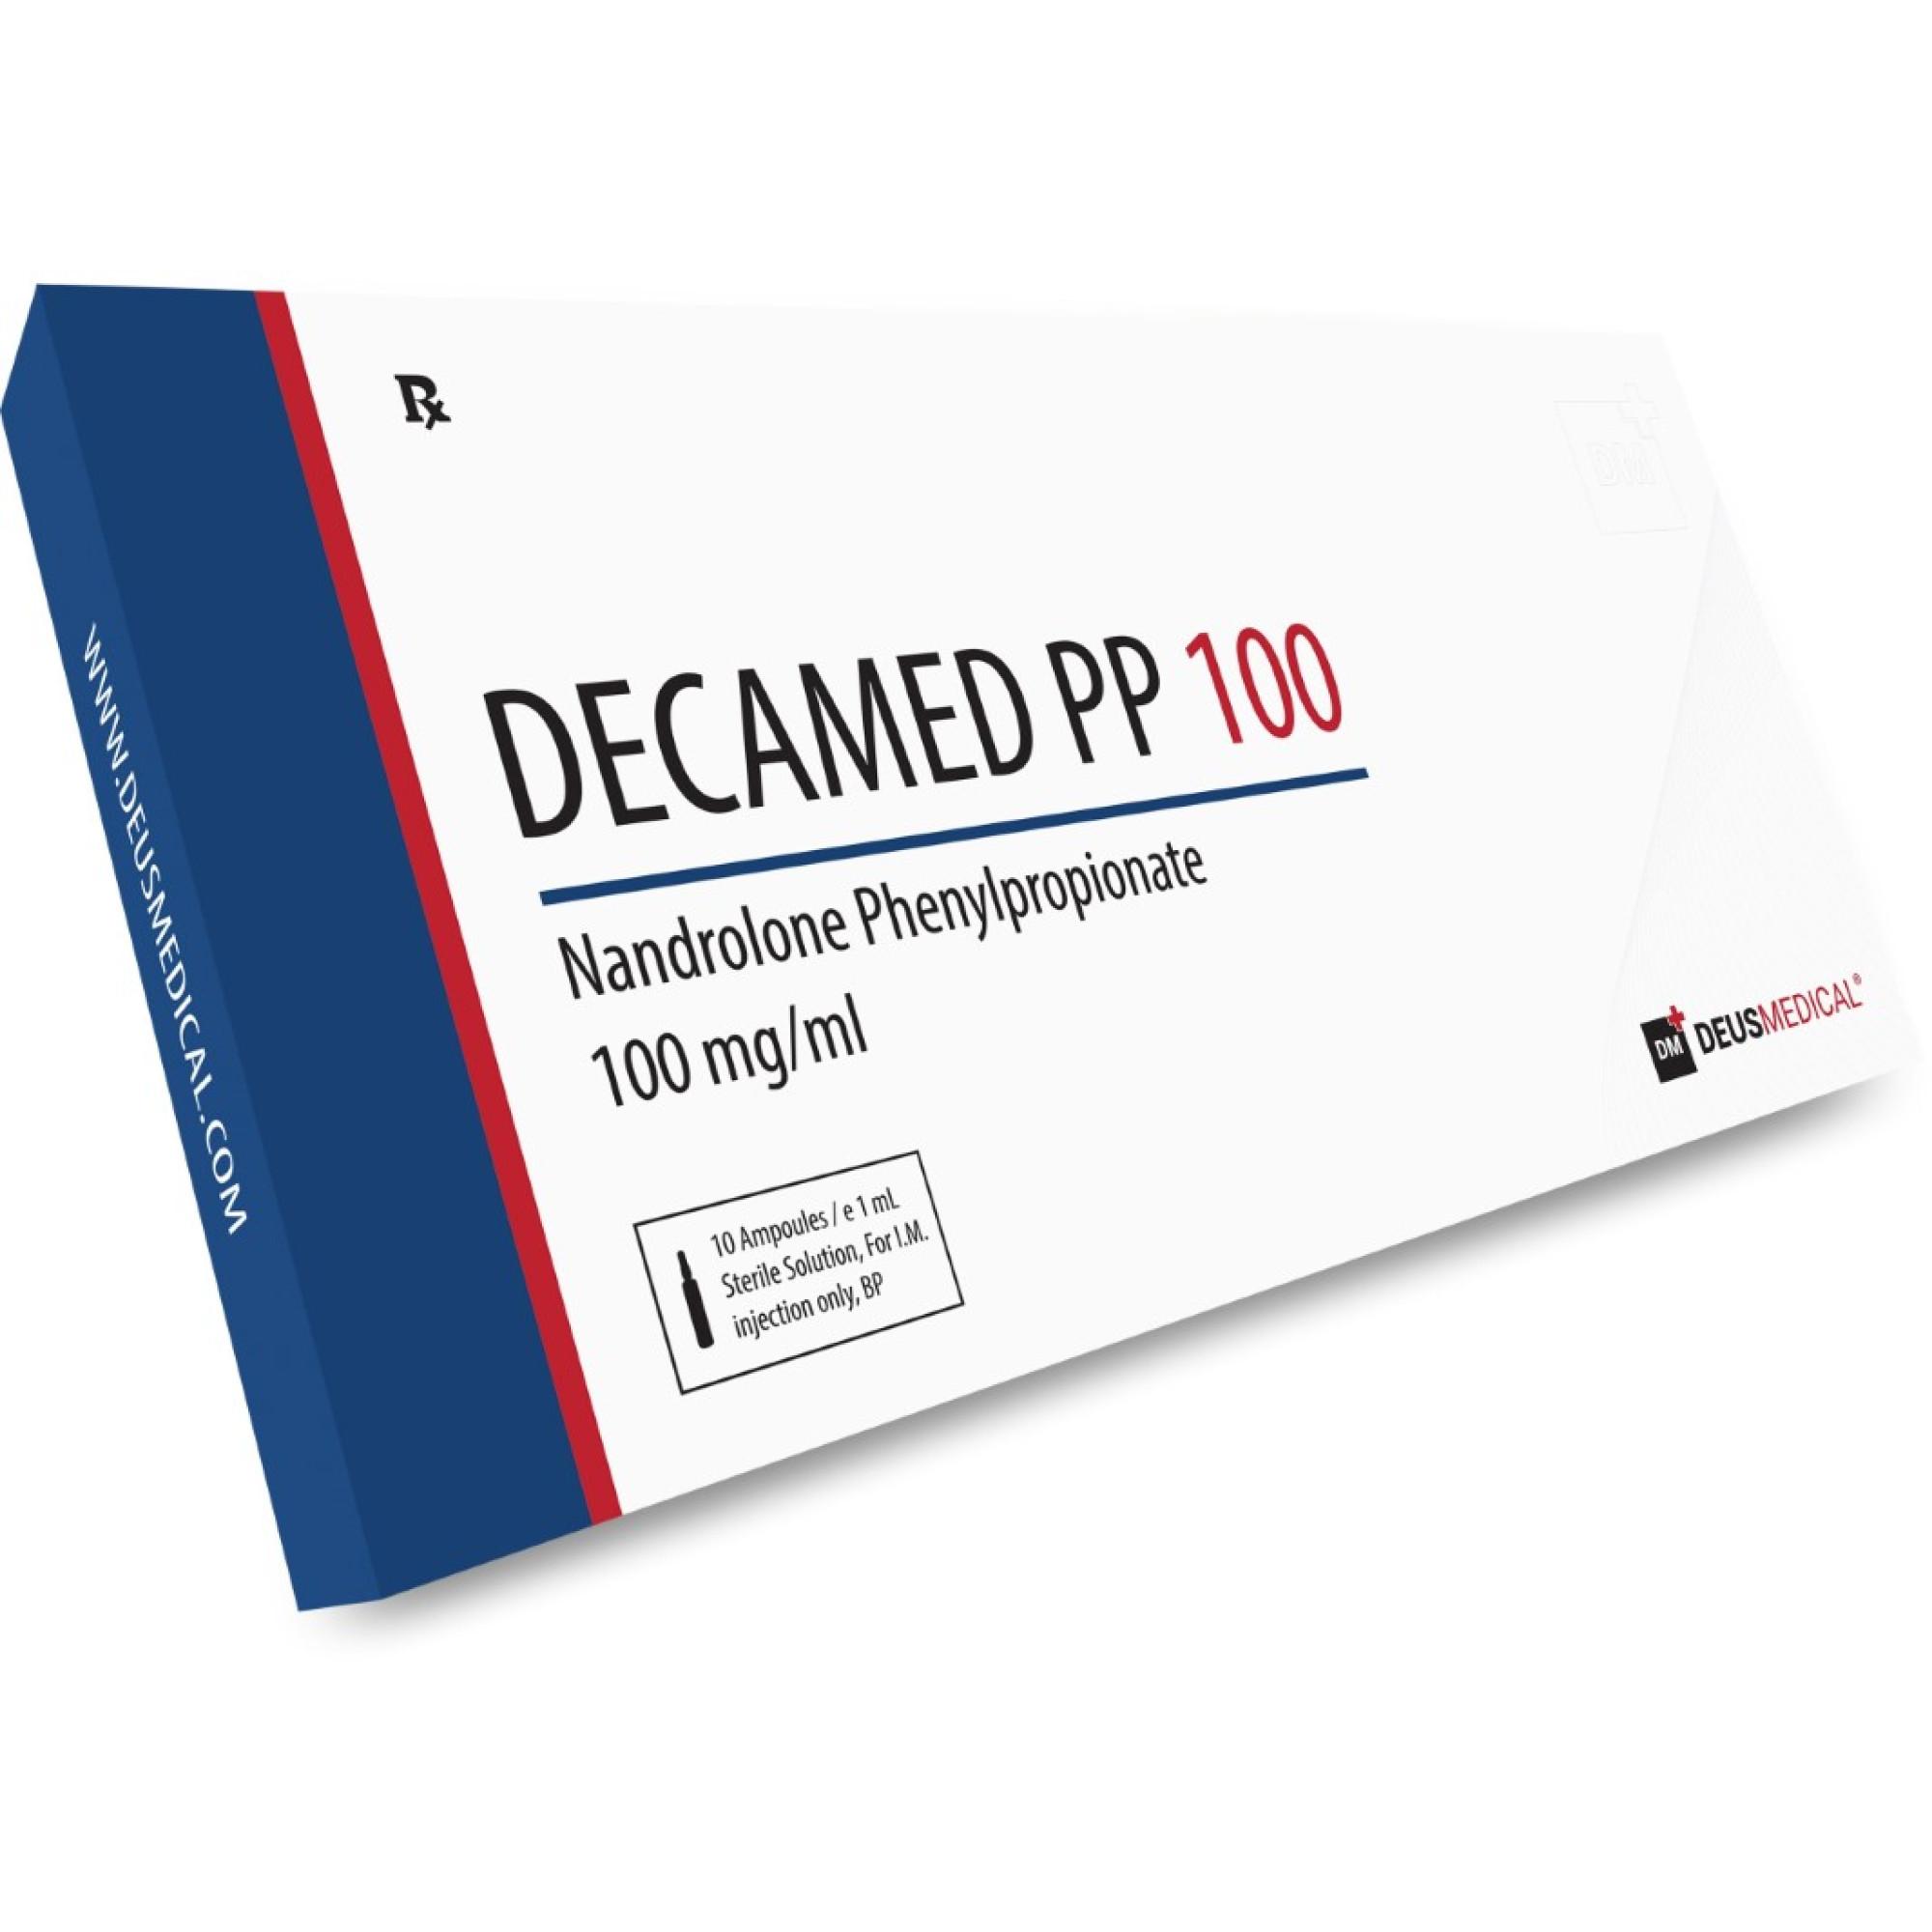 DECAMED PP 100 (Nandrolone Phenylpropionate), DEUS MEDICAL, BUY STEROIDS ONLINE - www.DEUSPOWER.com